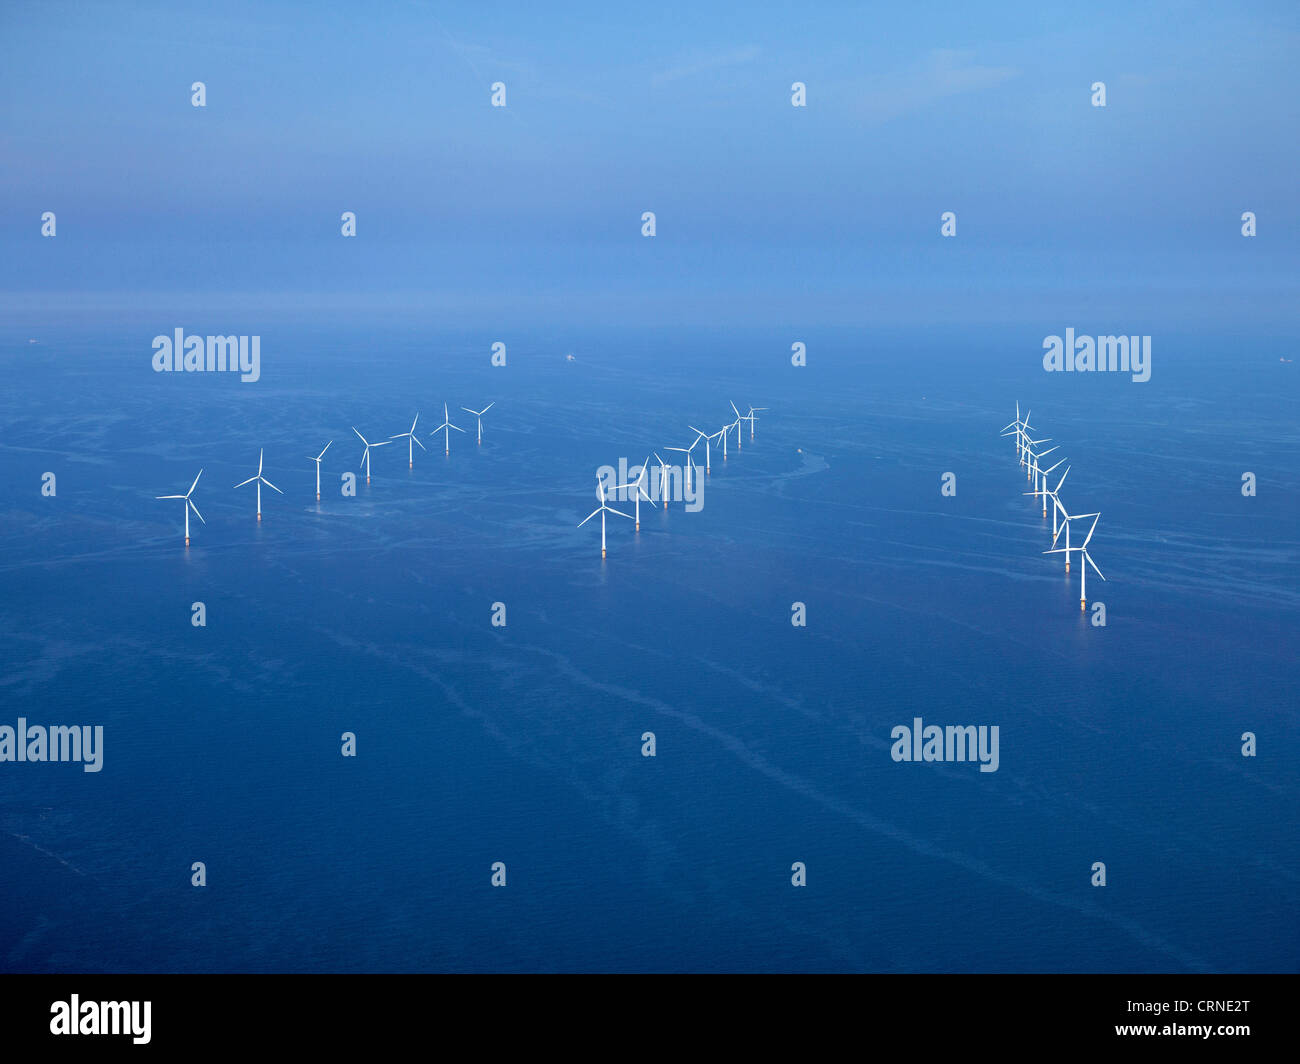 Off shore wind farm Liverpool Bay, spegnere il Wirral, Nord Ovest Inghilterra Immagini Stock